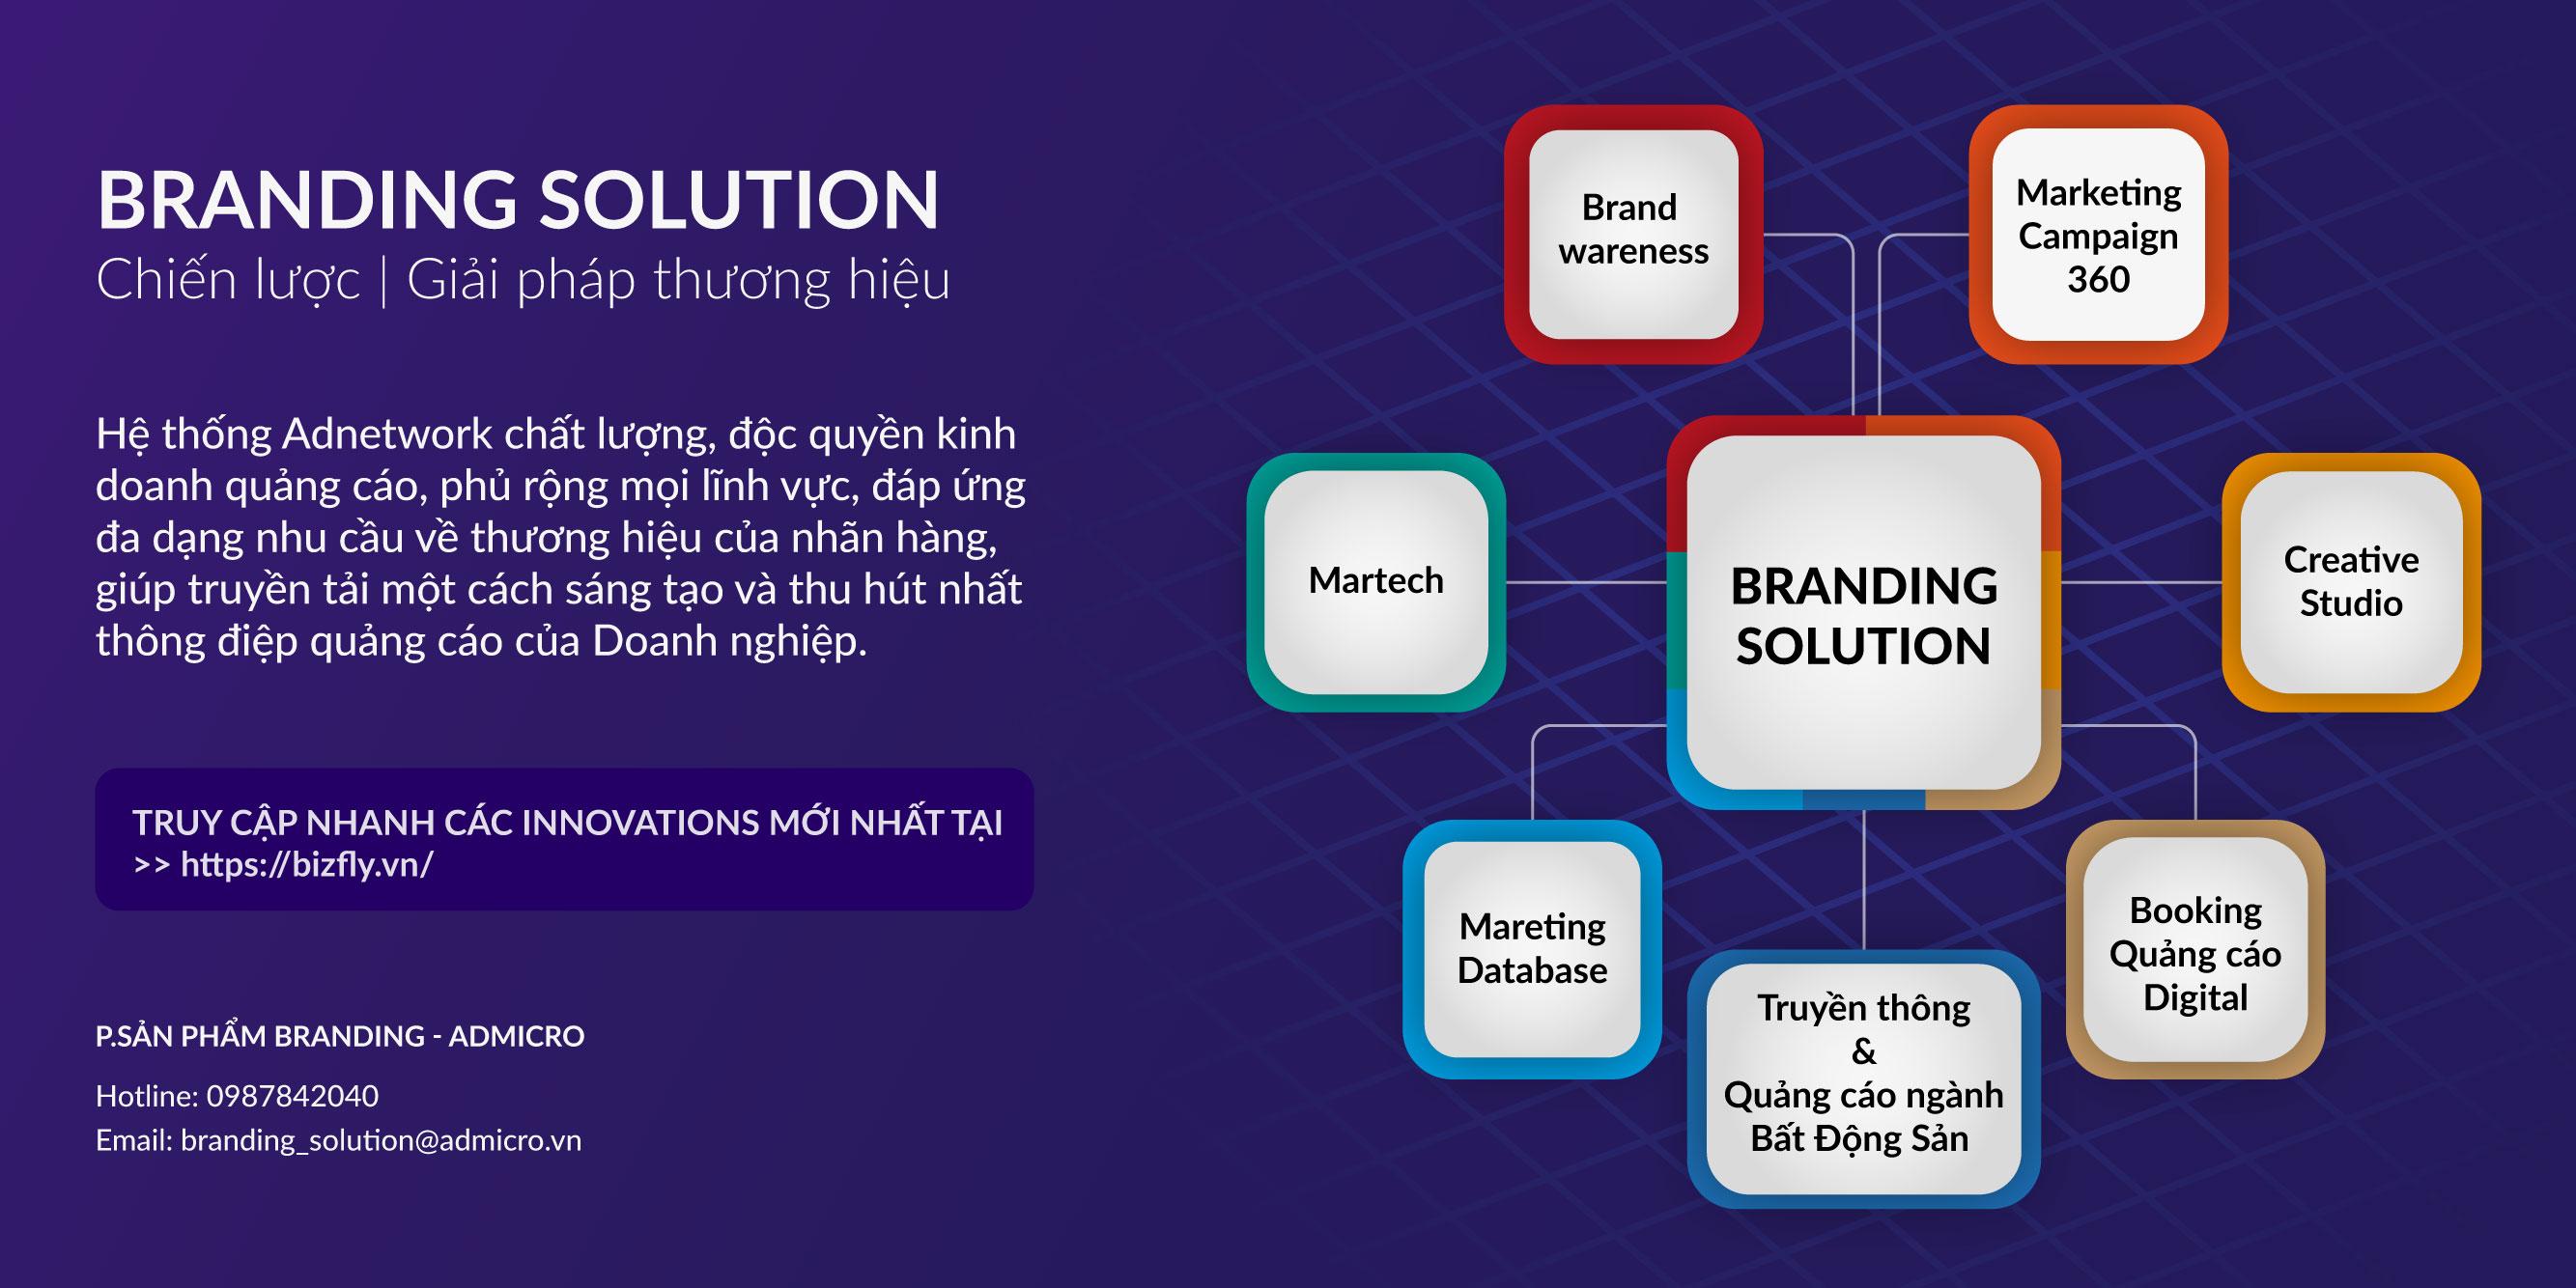 Branding solution